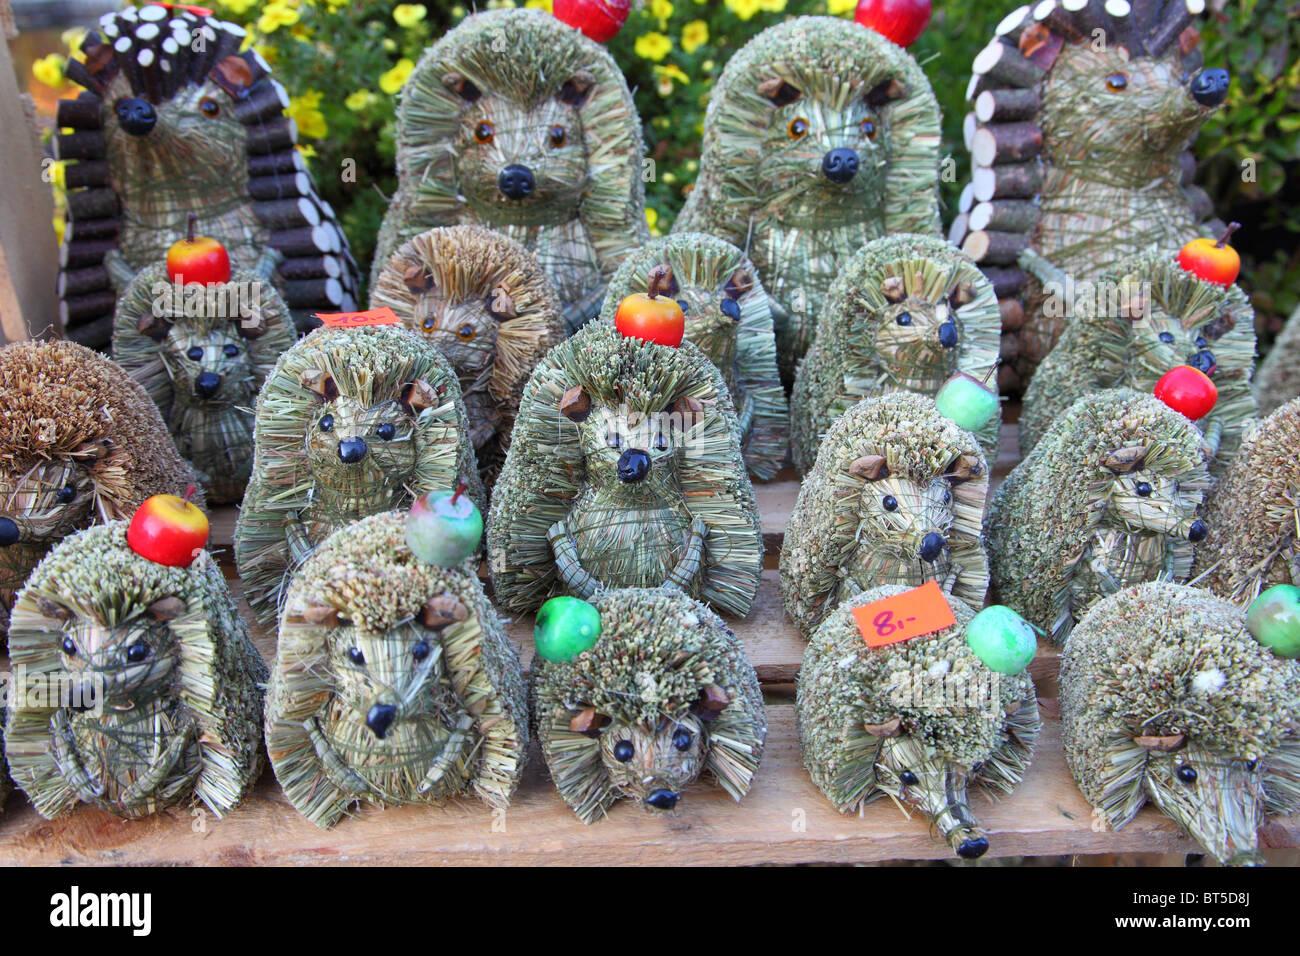 Hedgehogs hedgehog made of hay handicraft handiwork of Poland - Stock Image